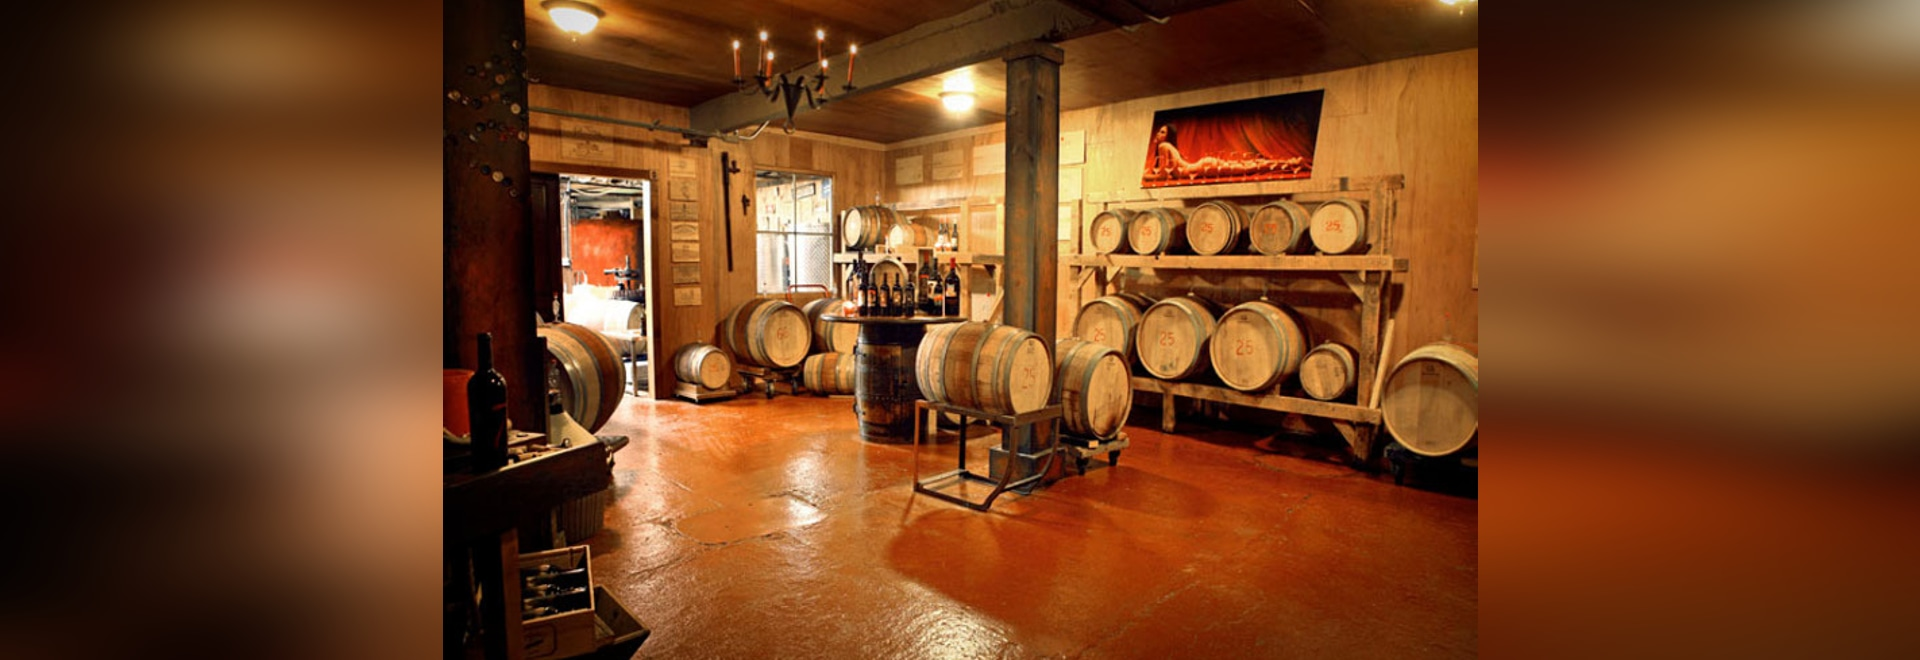 American Winery Uses Blulog Technology